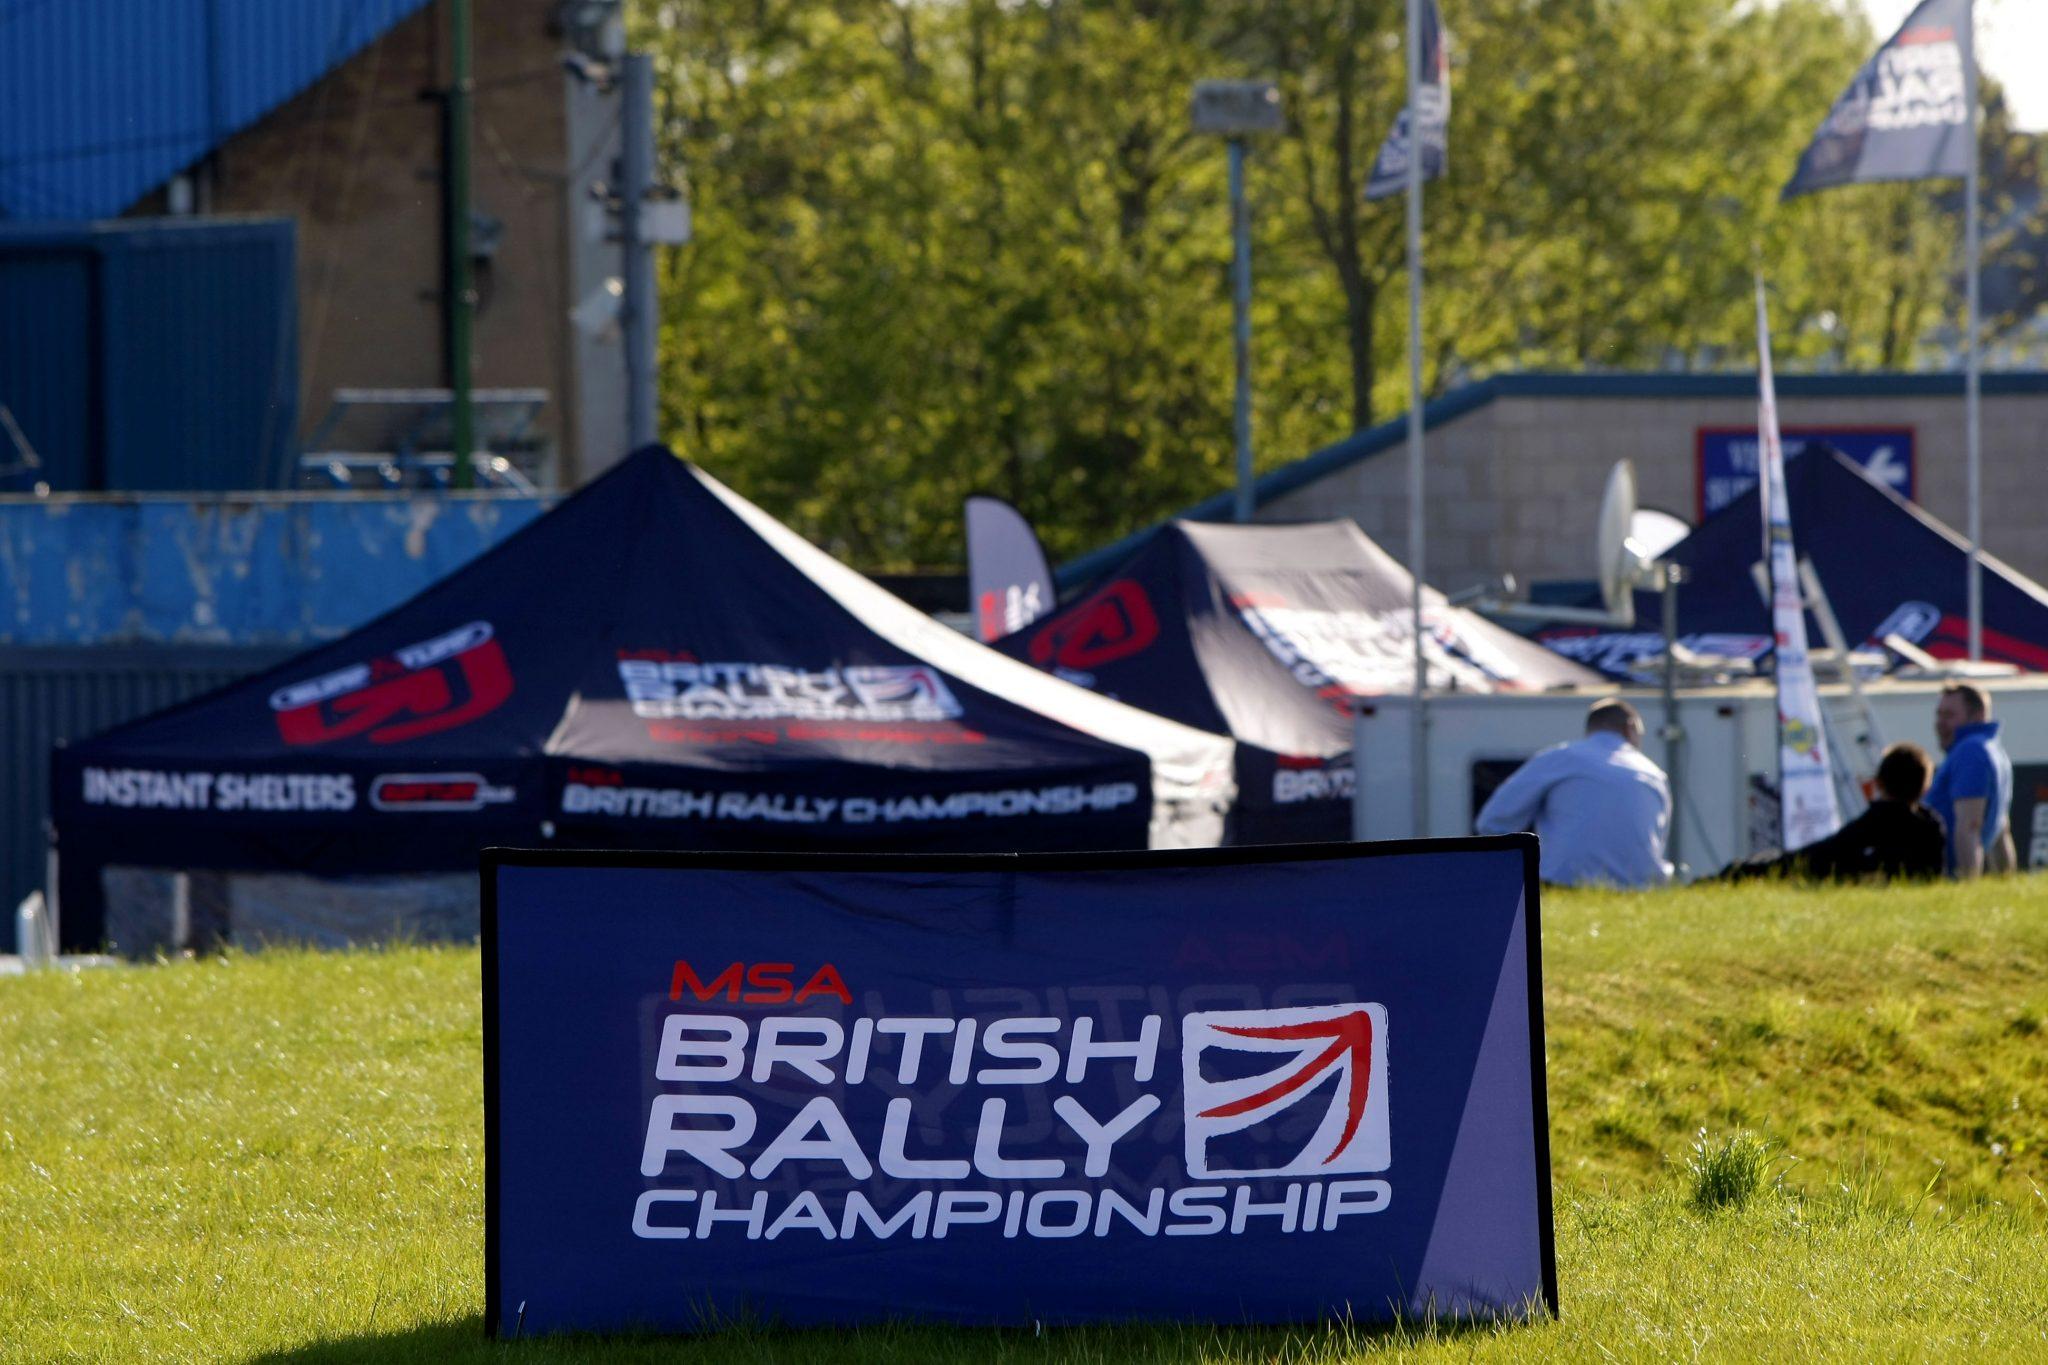 2998, 2998, British Rally Championship, BRC-05.jpg, 347844, https://surfturf.co.uk/wp-content/uploads/2018/06/BRC-05.jpg, https://surfturf.co.uk/case-studies/british-rally/attachment/british-rally-championship-7/, , 3, , British Rally Championship, british-rally-championship-7, inherit, 849, 2018-11-28 14:22:25, 2018-11-28 14:22:25, 0, image/jpeg, image, jpeg, https://surfturf.co.uk/wp-includes/images/media/default.png, 2048, 1365, Array